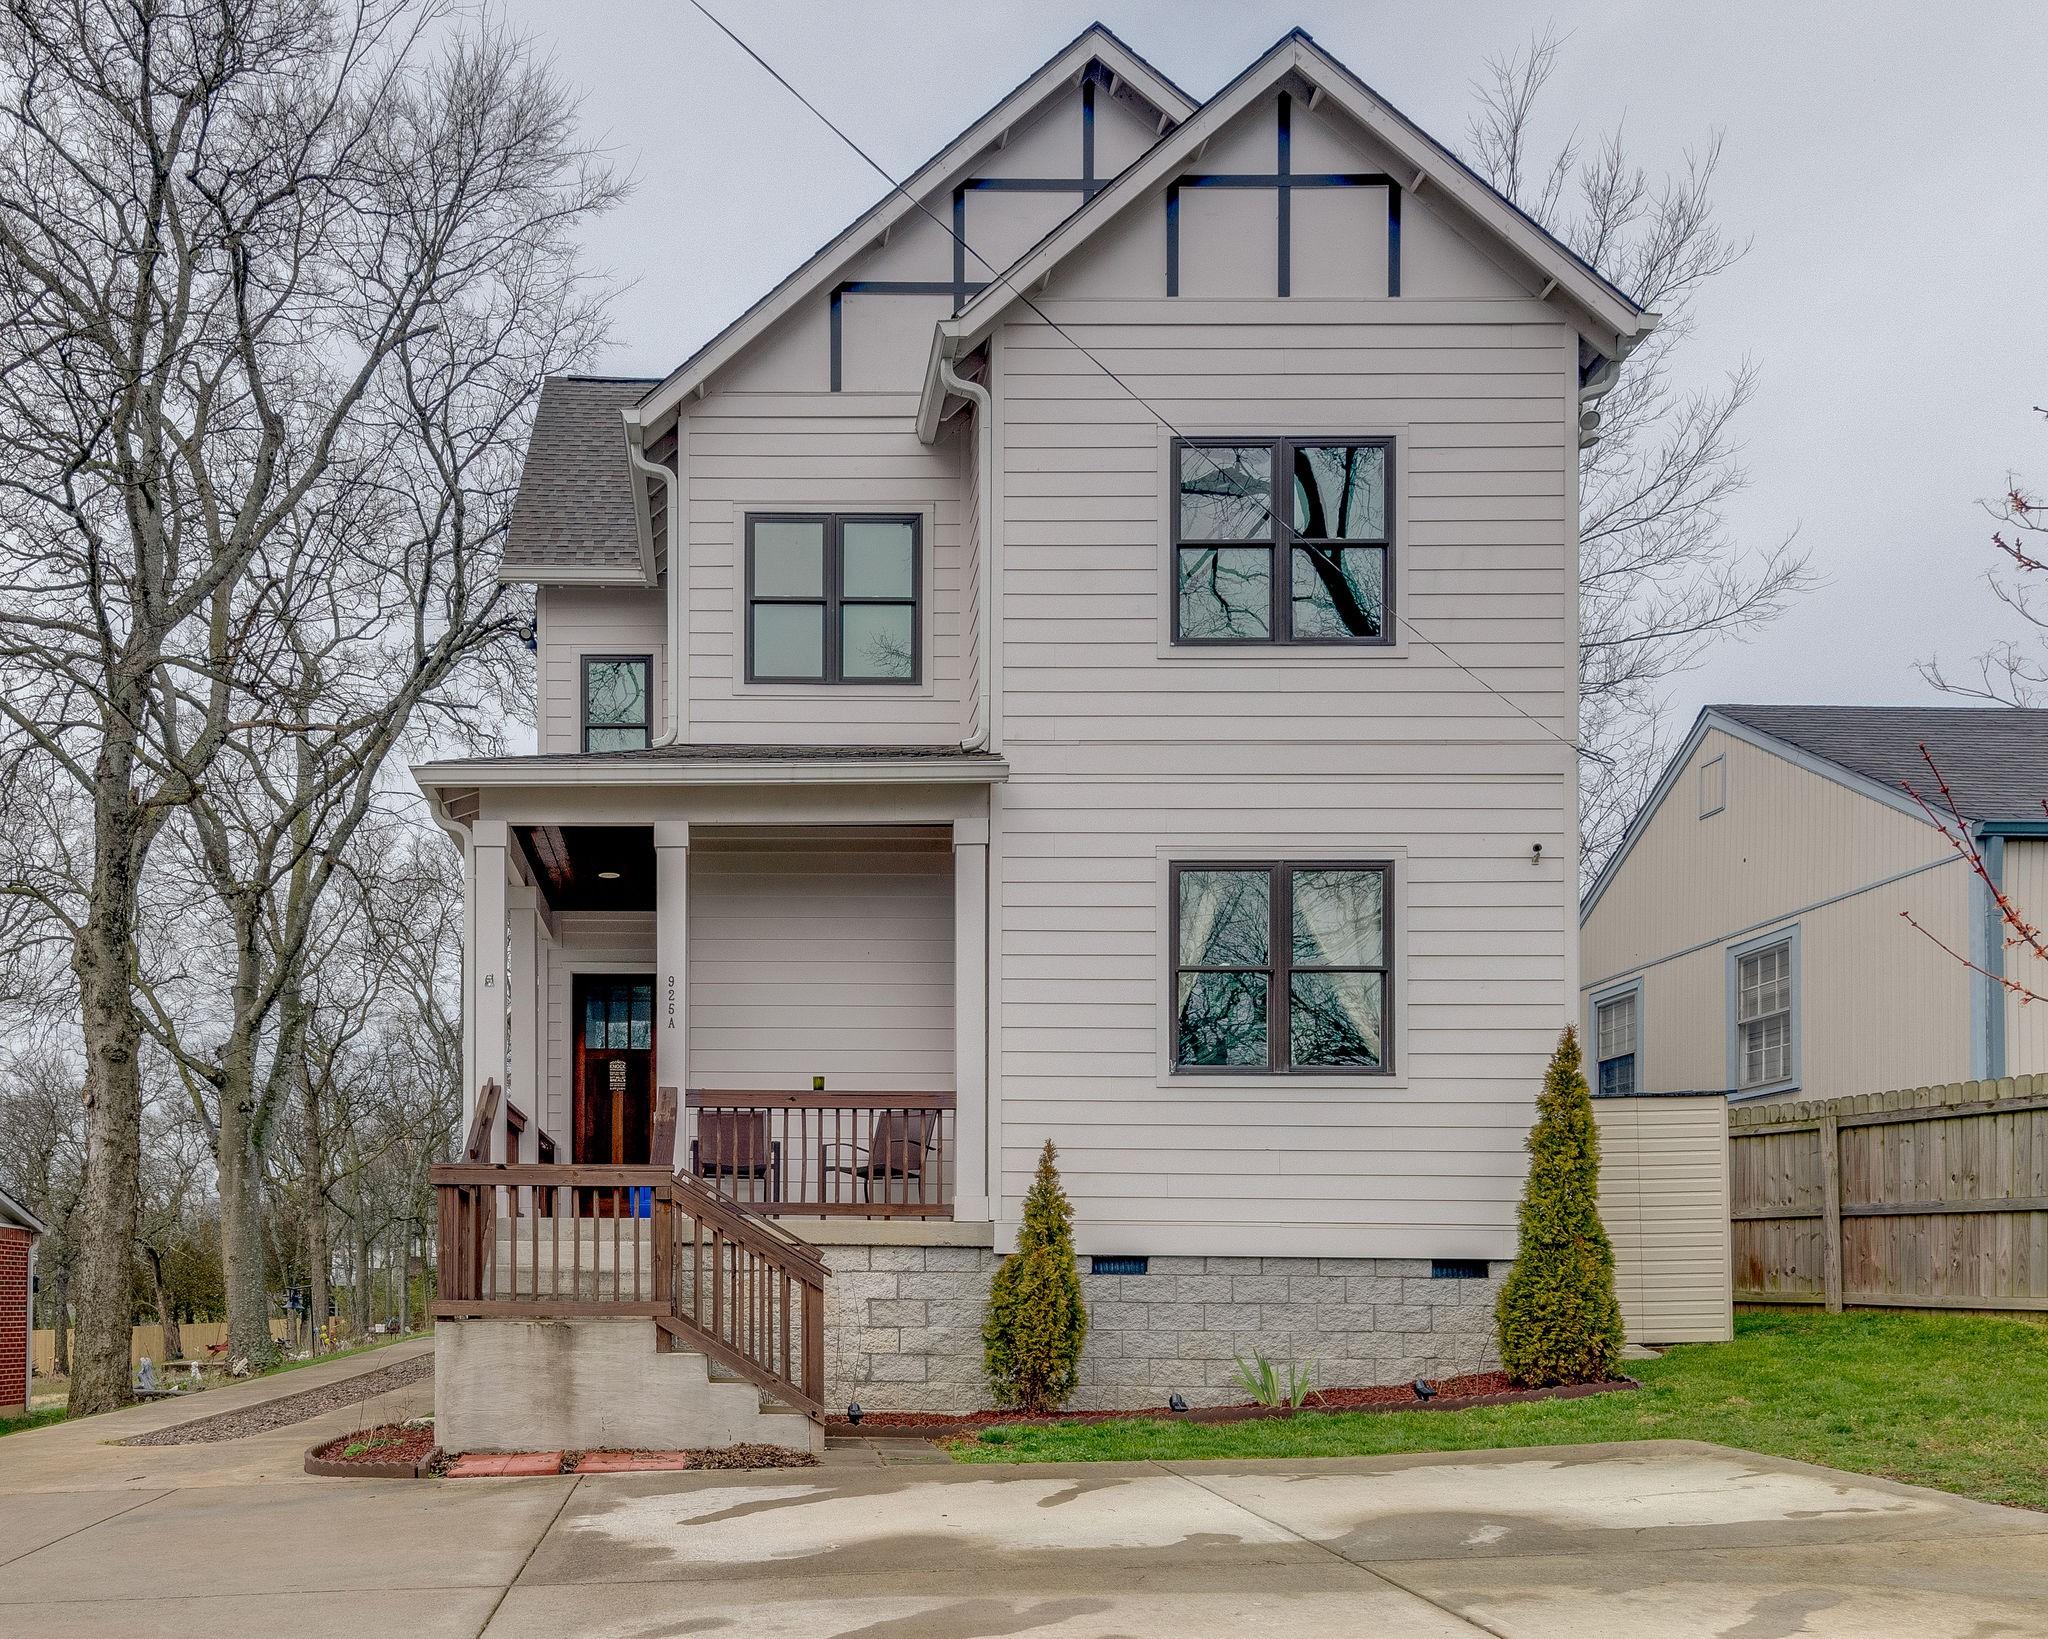 925A Elvira Ave, Nashville, TN 37216 - Nashville, TN real estate listing